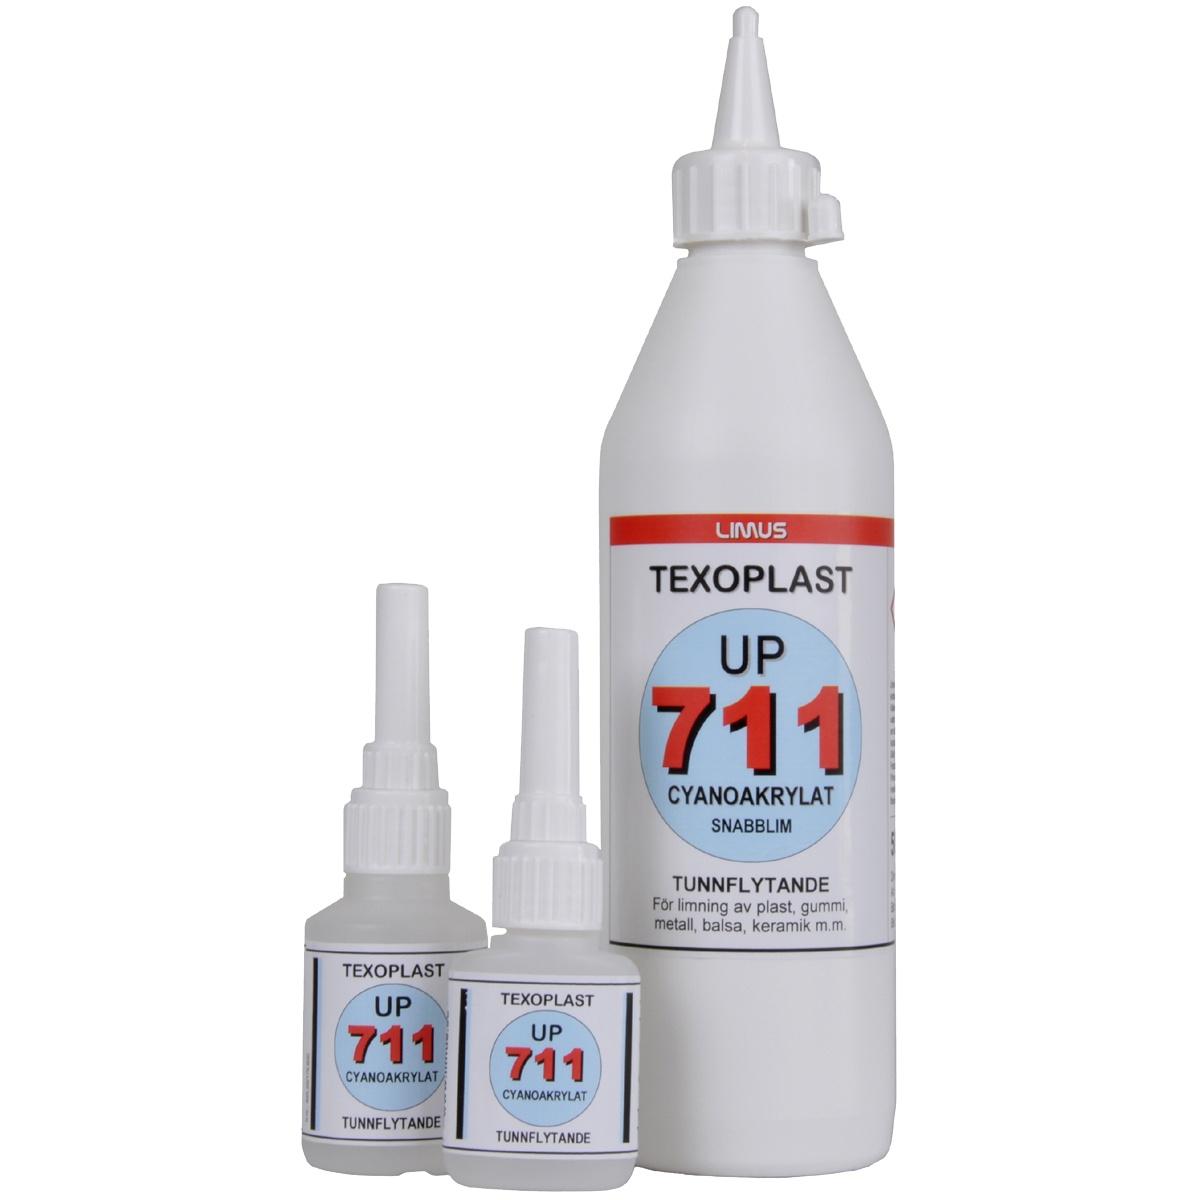 TEXOPLAST UP711